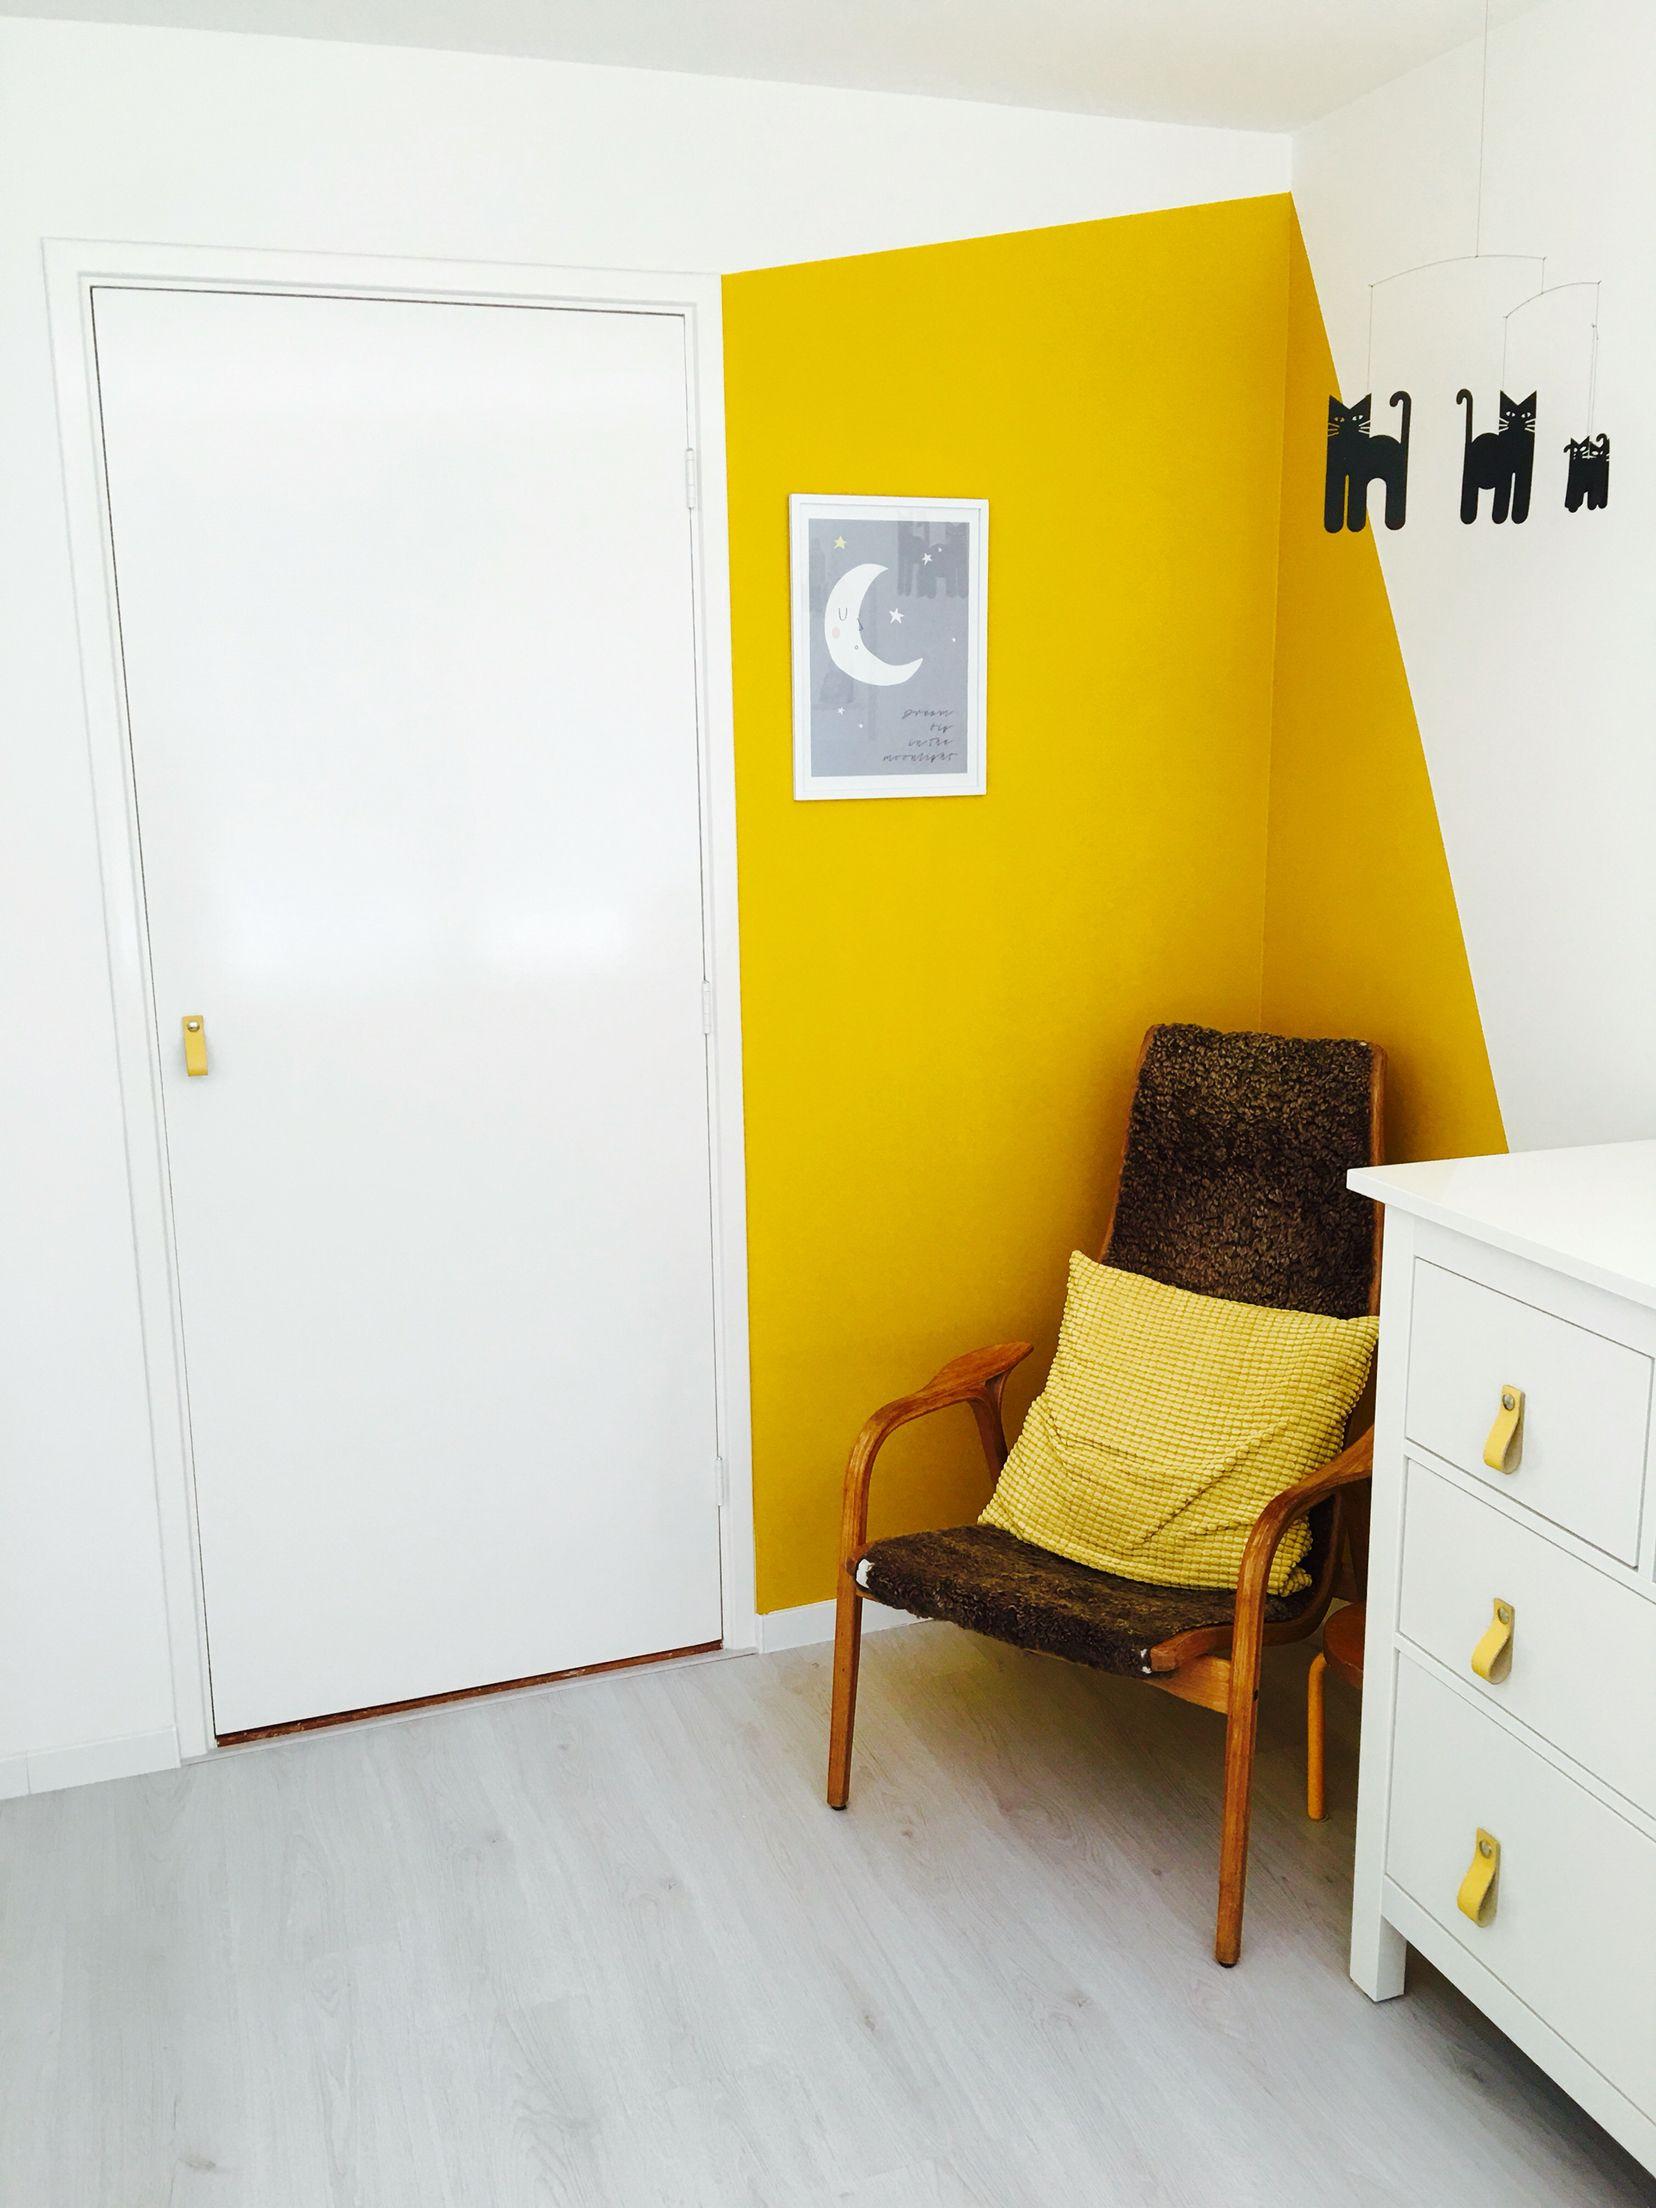 Babykamer mimosa geel op de muur met swedese stoel nu for Interieur van nu